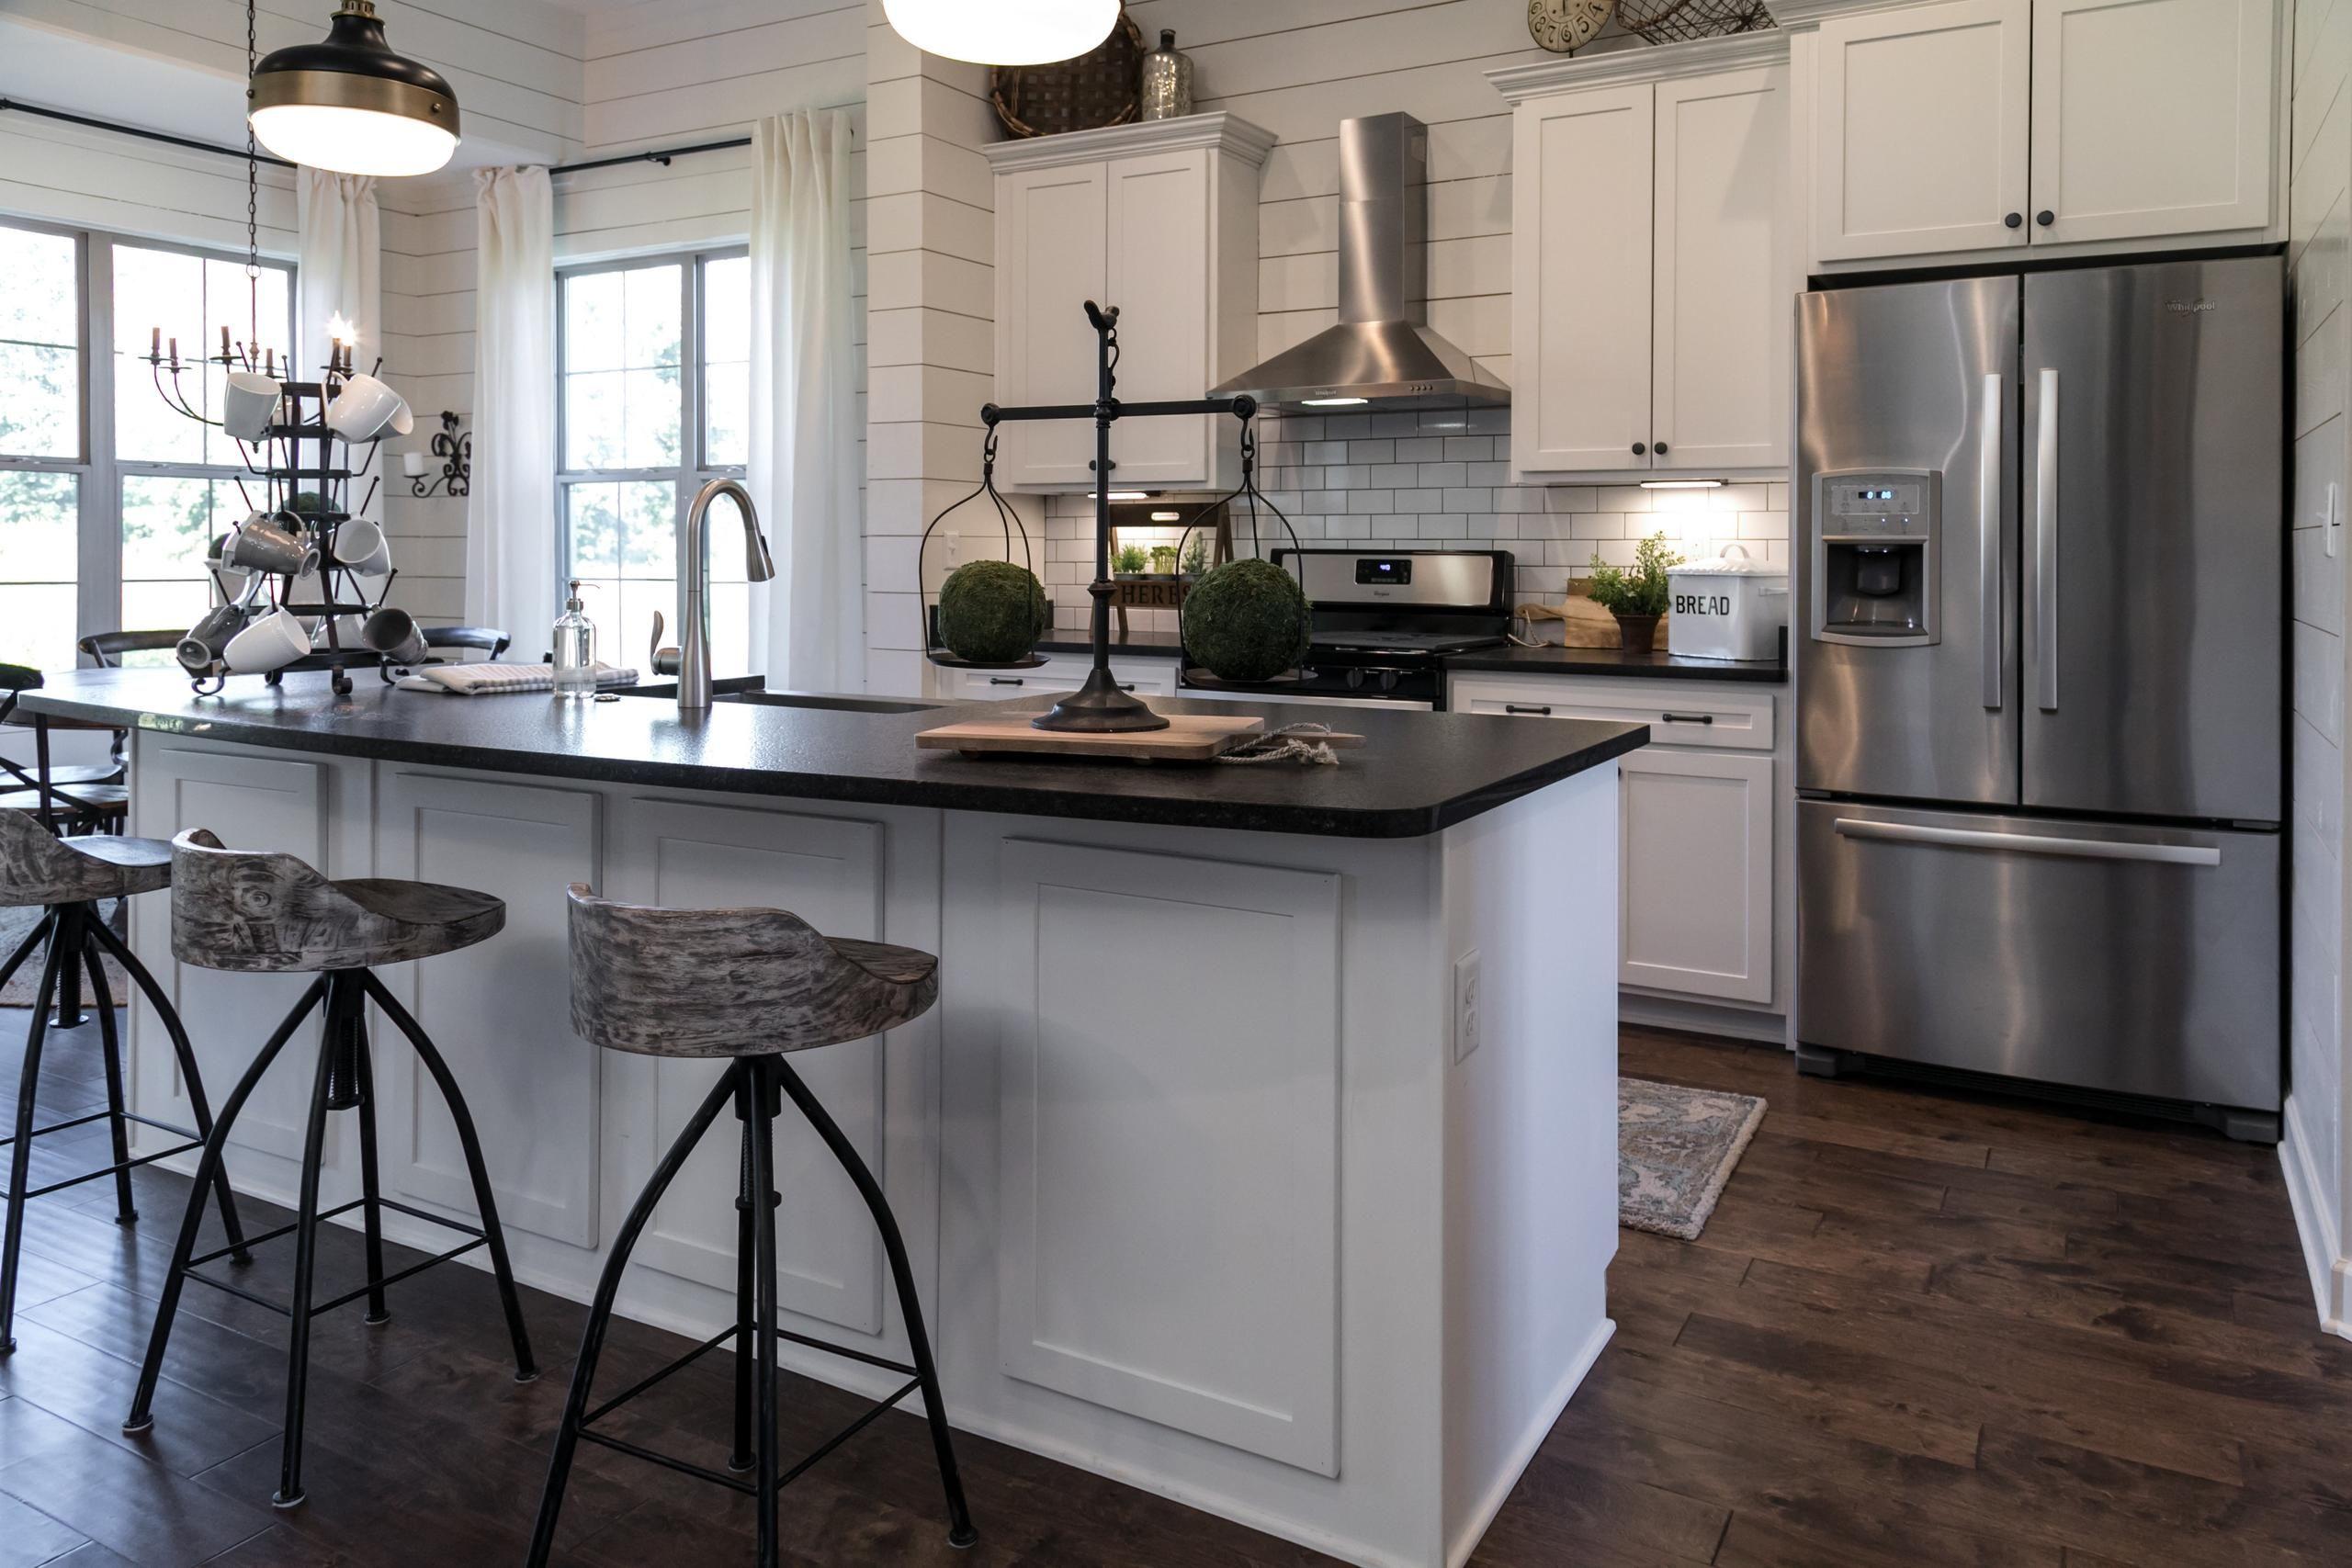 Newregencyhomes Com Abbington Kitchen Design Open White Kitchen Open Concept White Kitchen Design